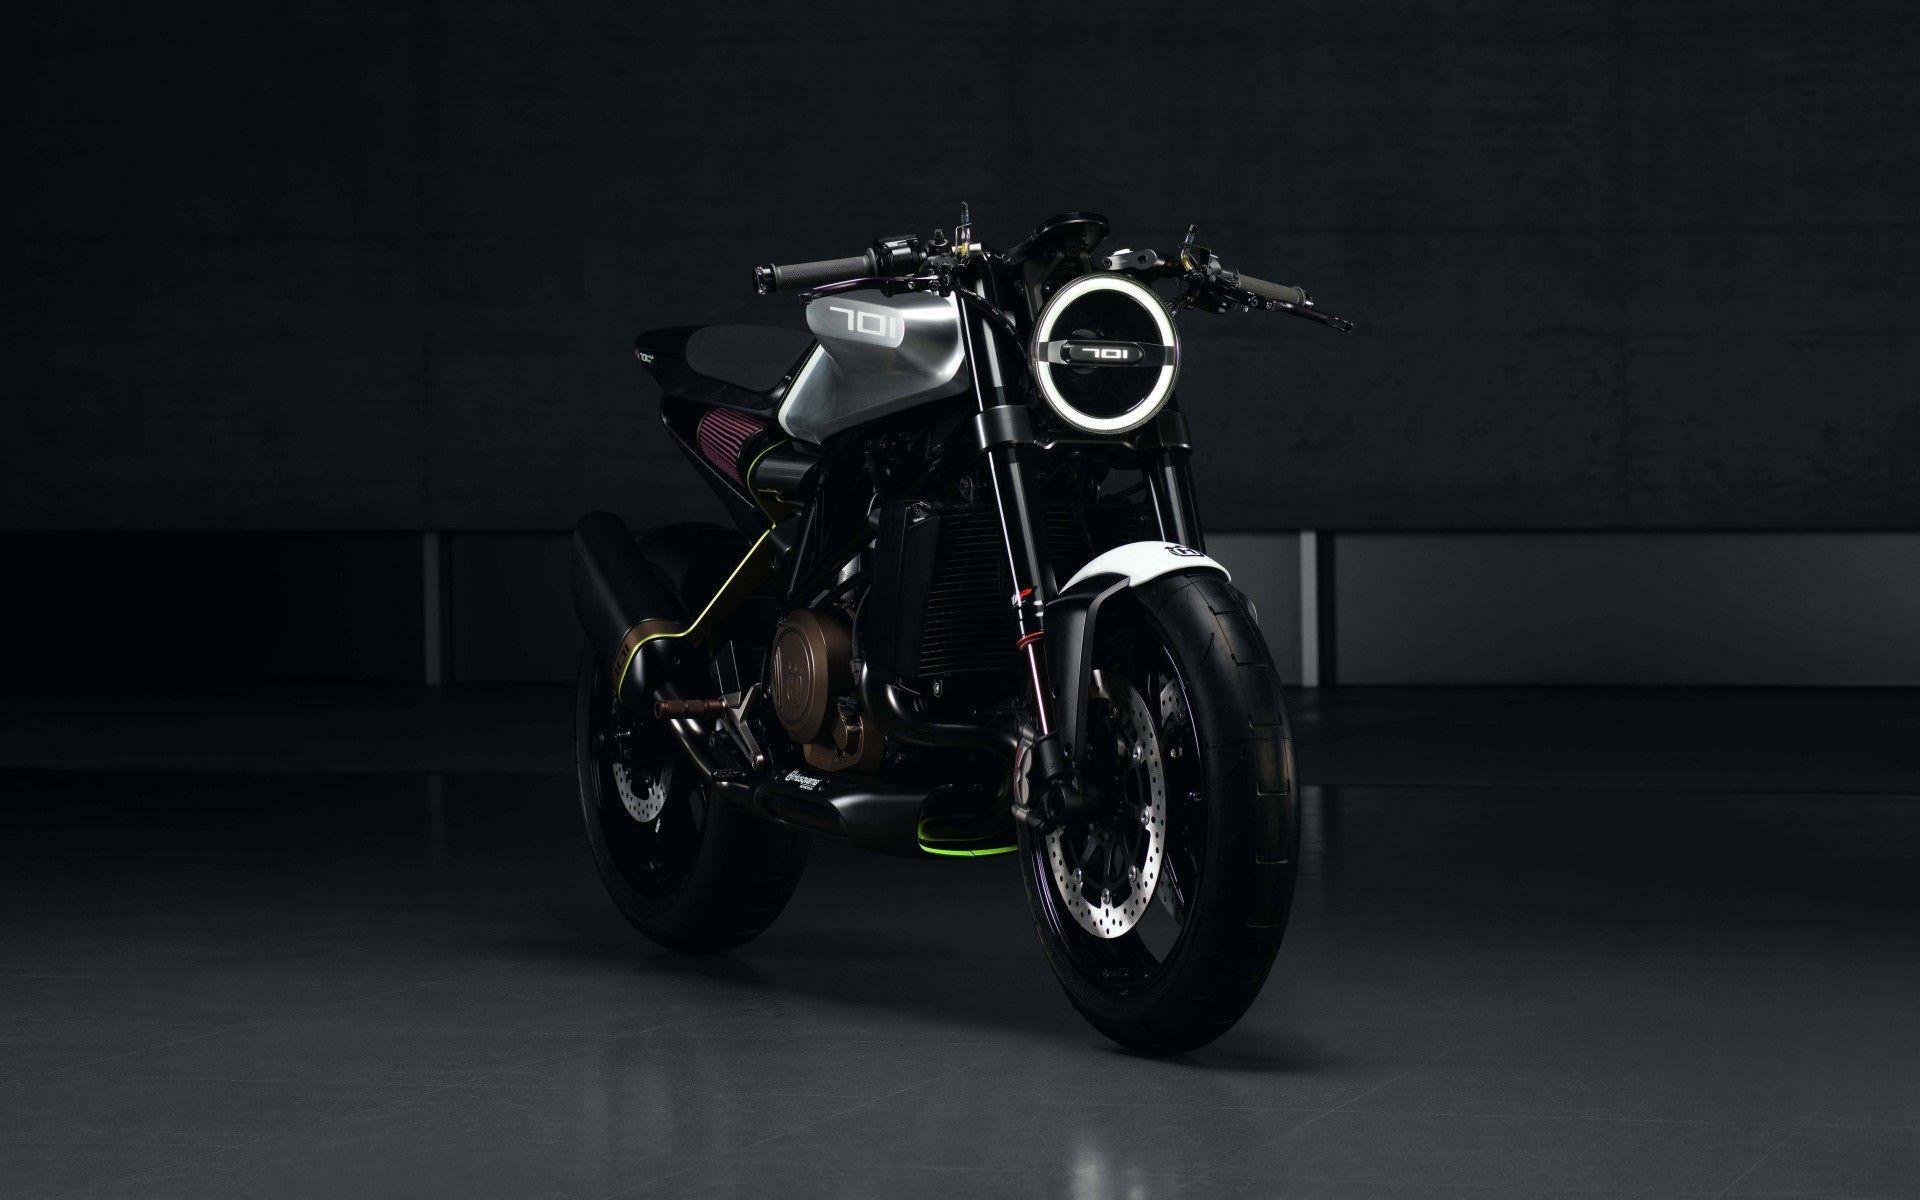 Sport Bike Black Wallpaper: Black Bike Wallpapers